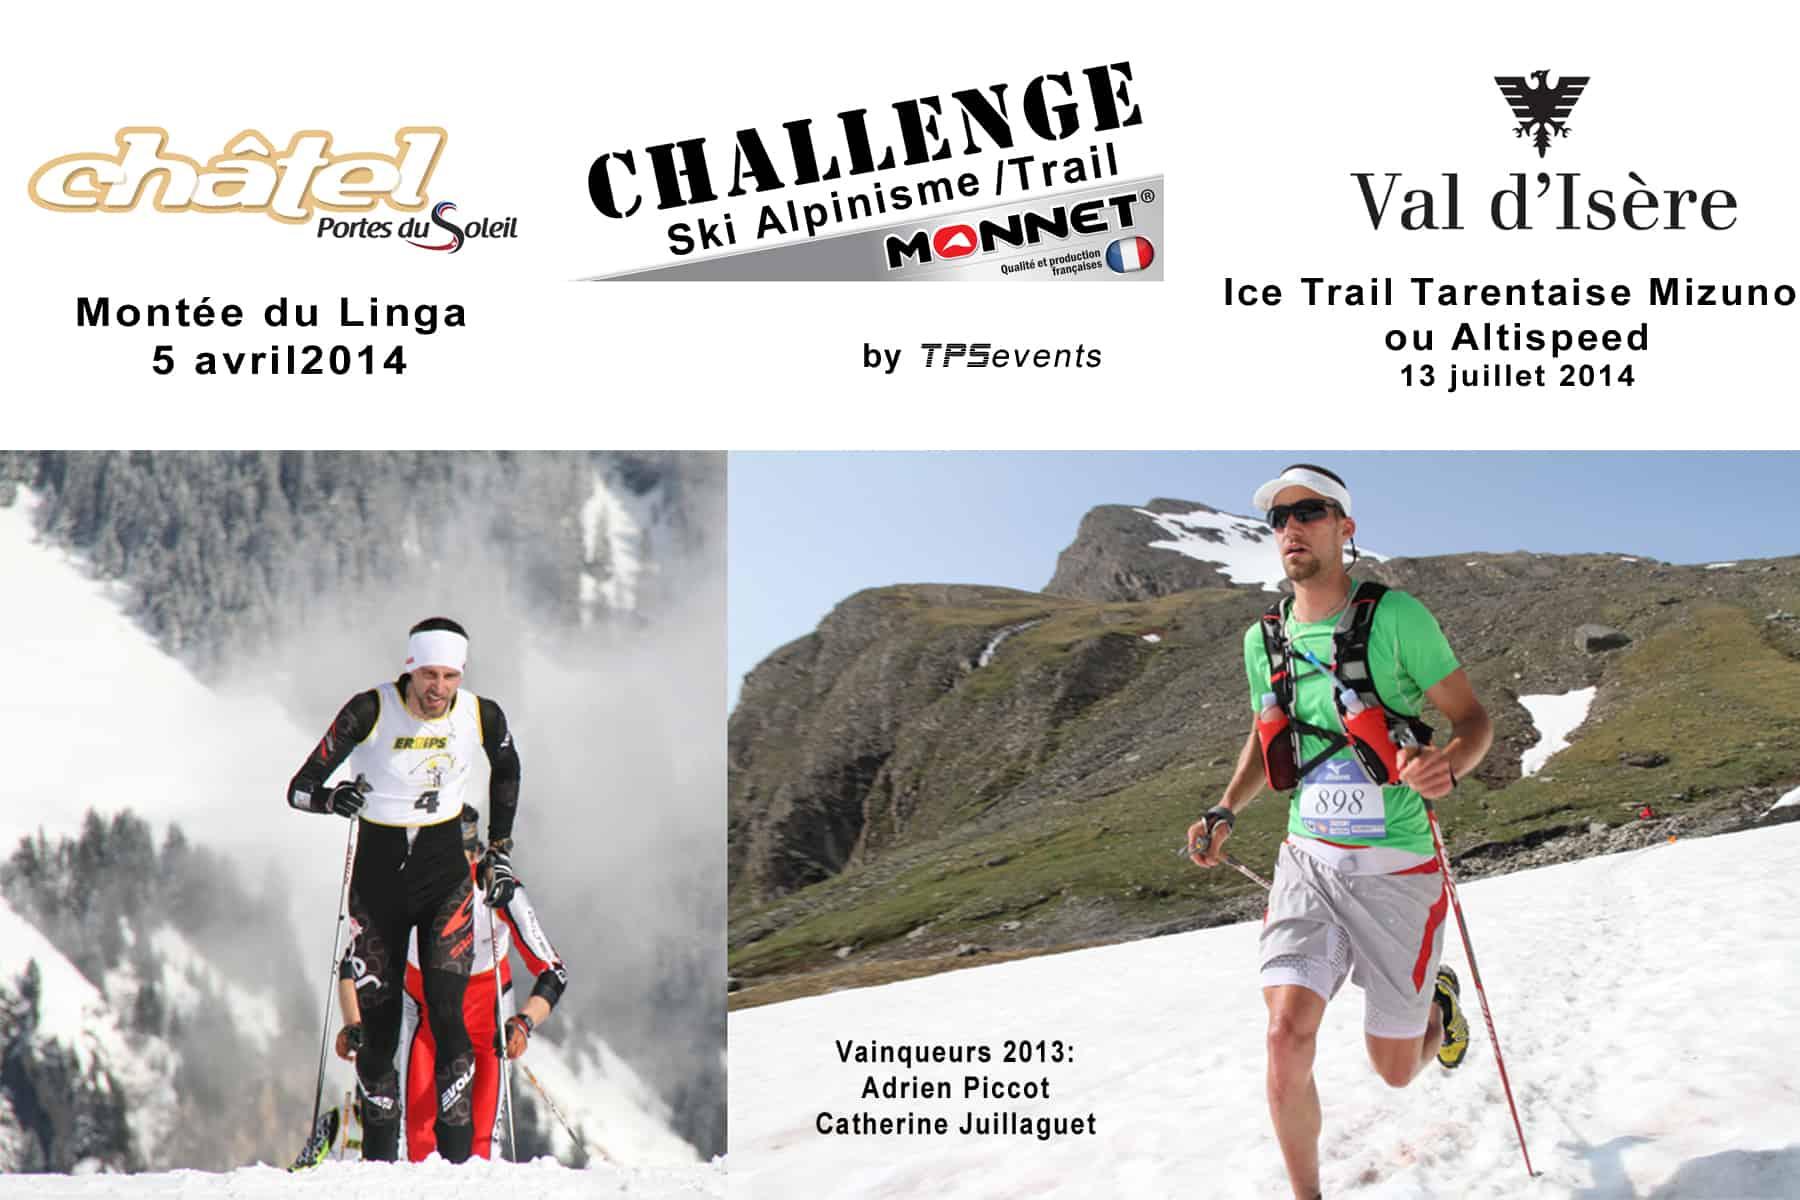 Challenge skitrail